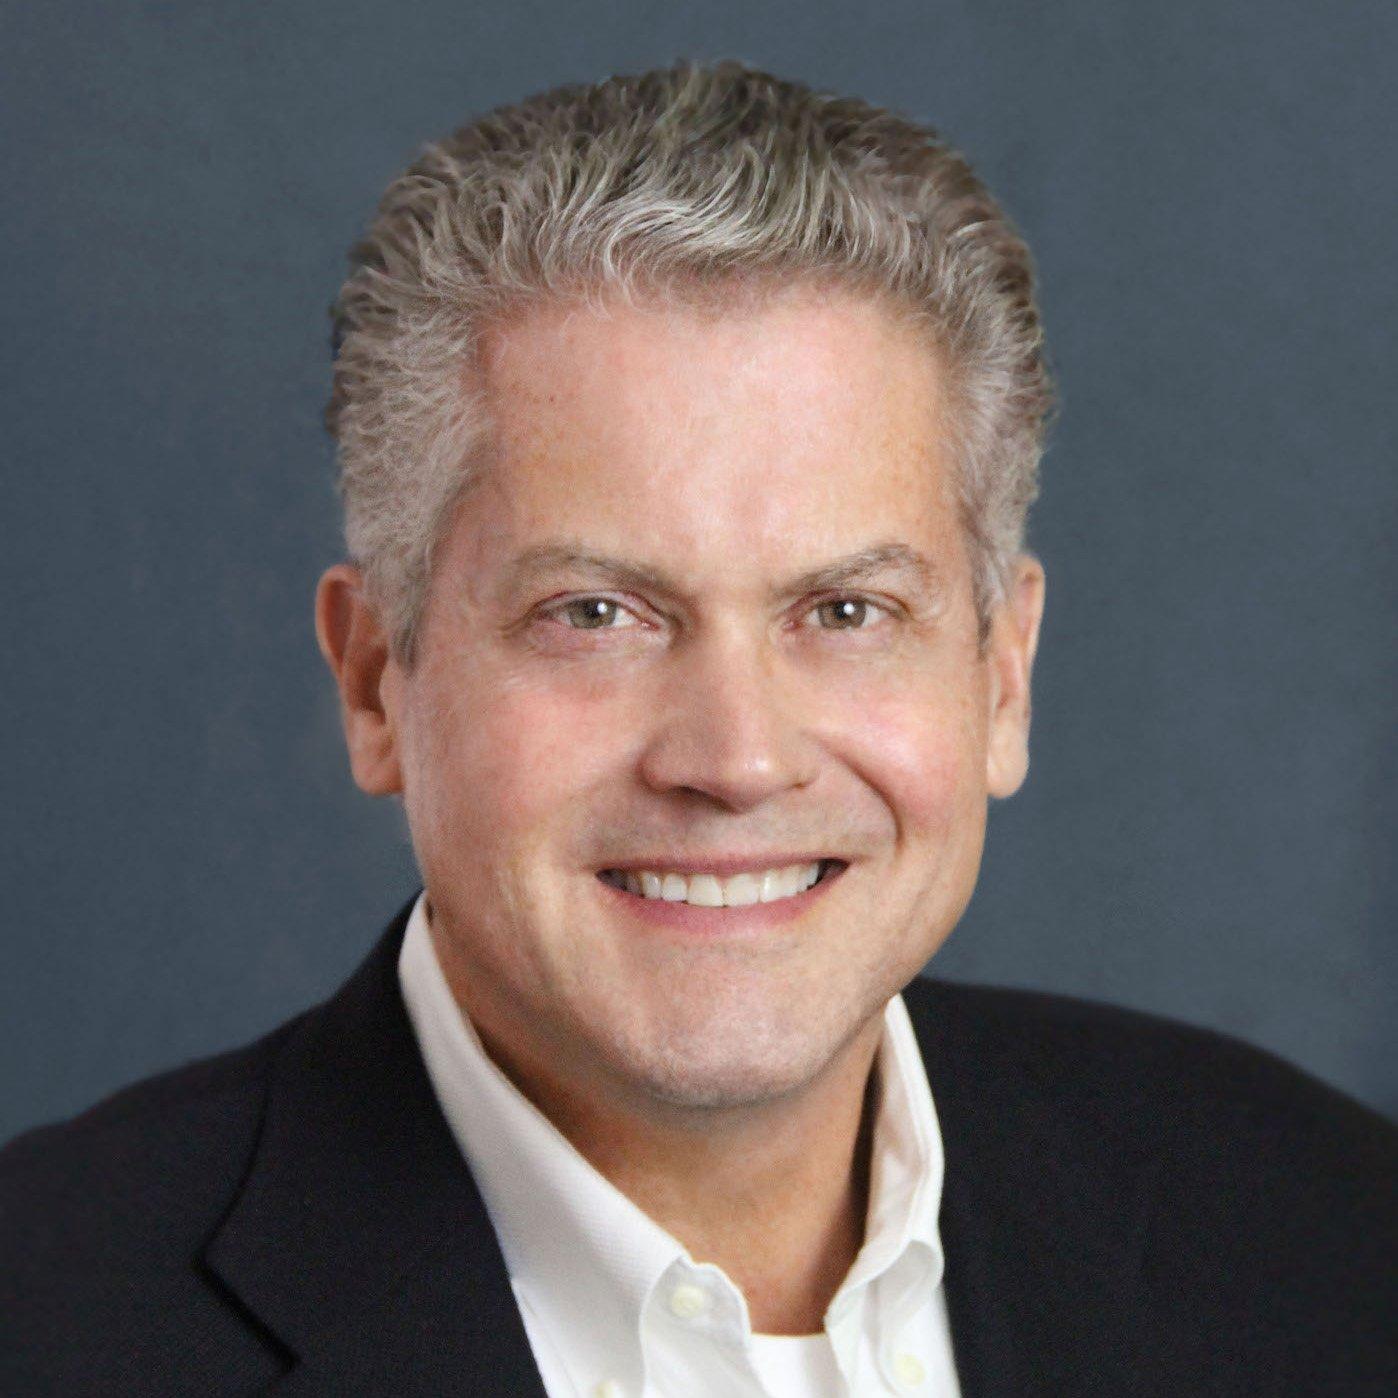 Michael Rareshide